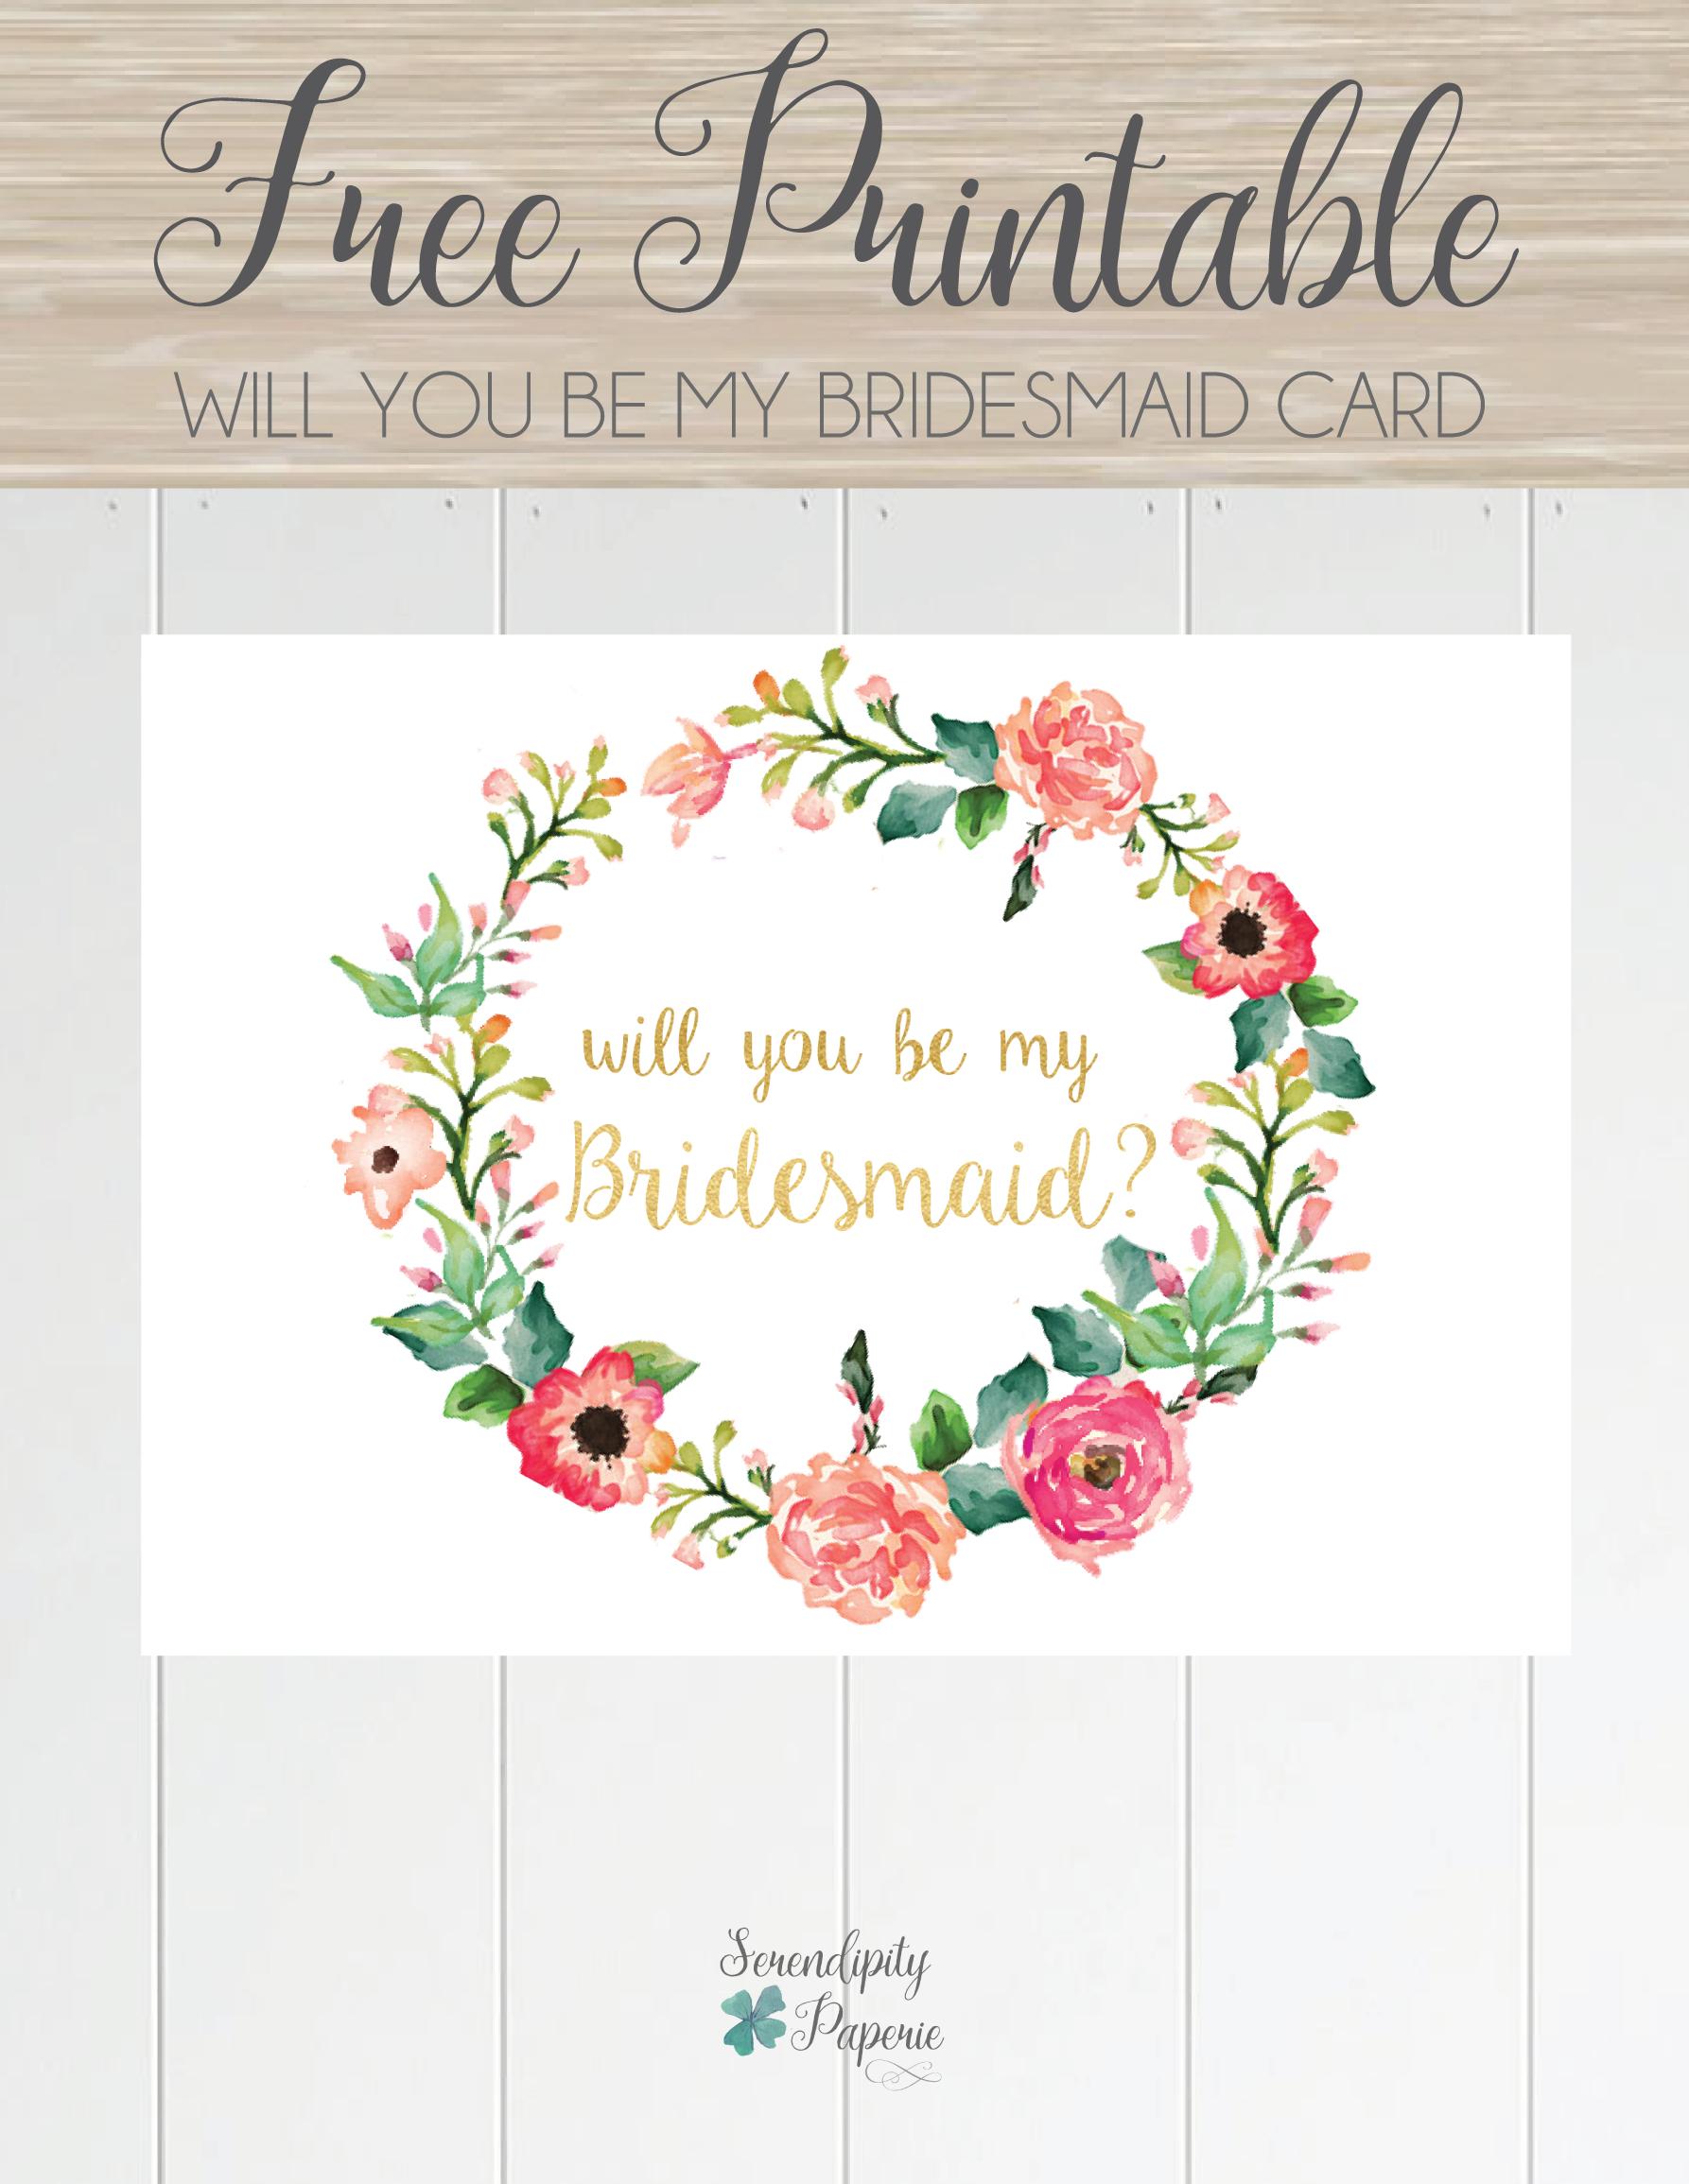 Free Printable Will You Be My Bridesmaid Card. Only At Serendipity - Free Printable Will You Be My Bridesmaid Cards